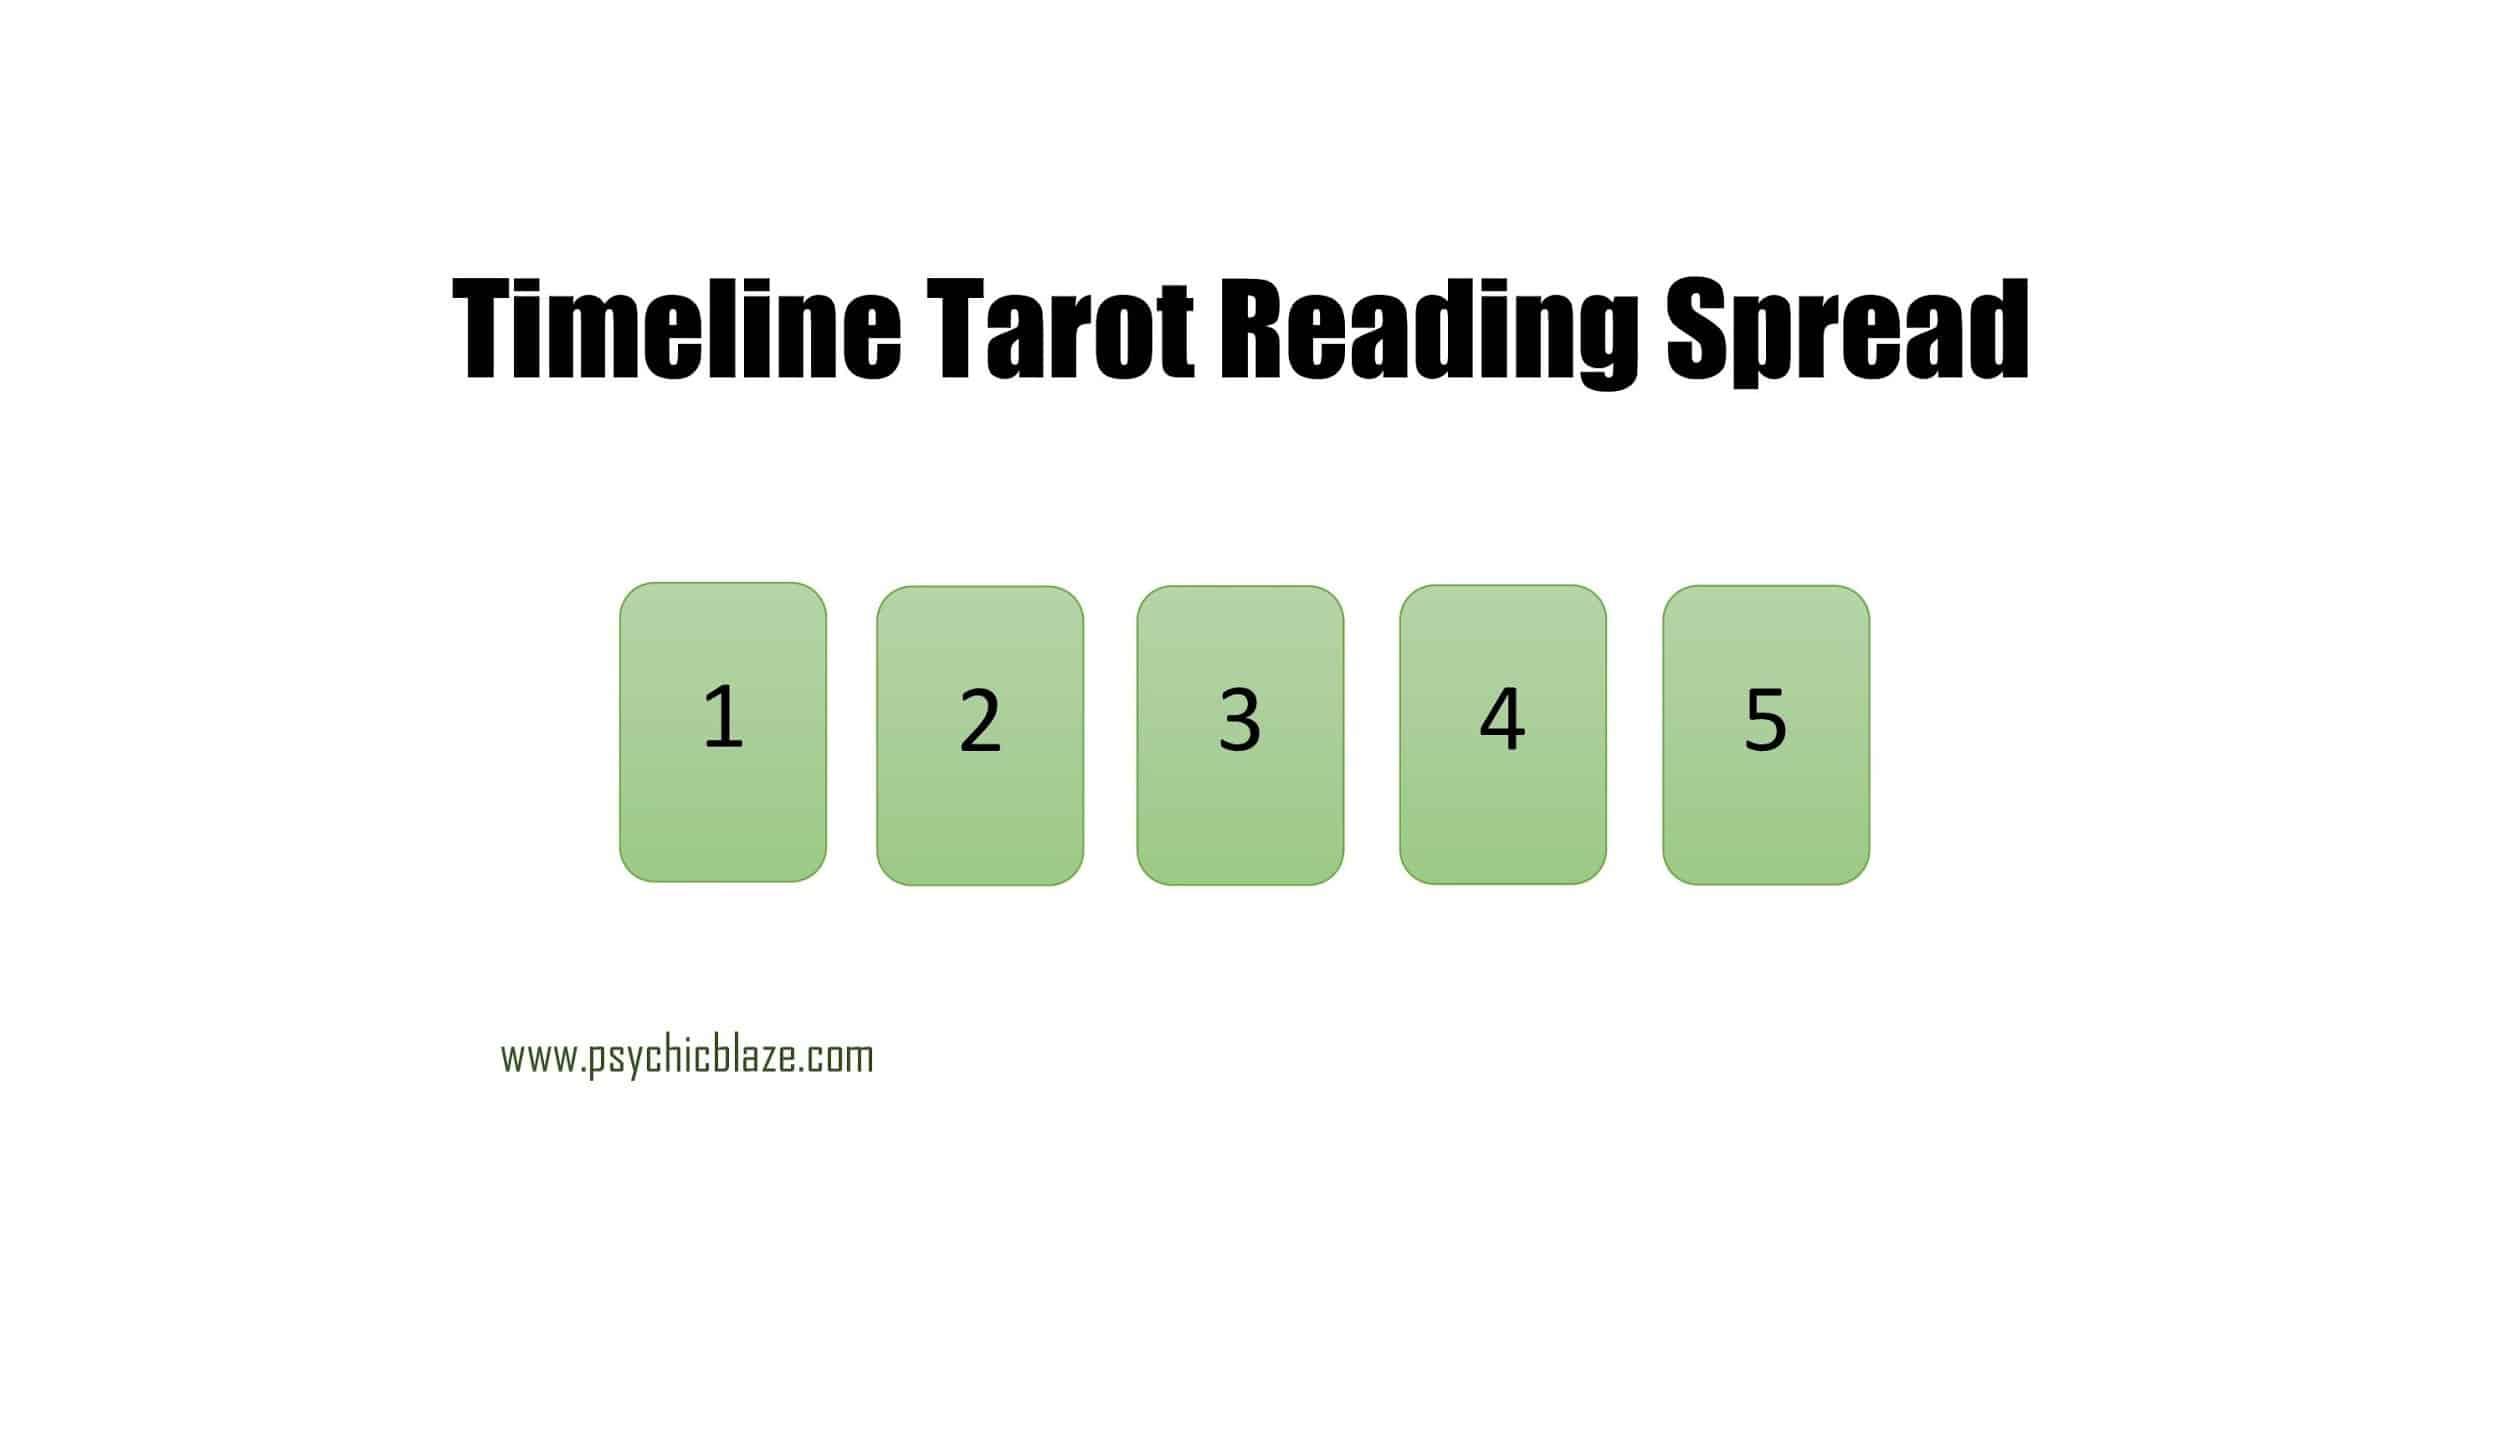 timeline tarot reading spread